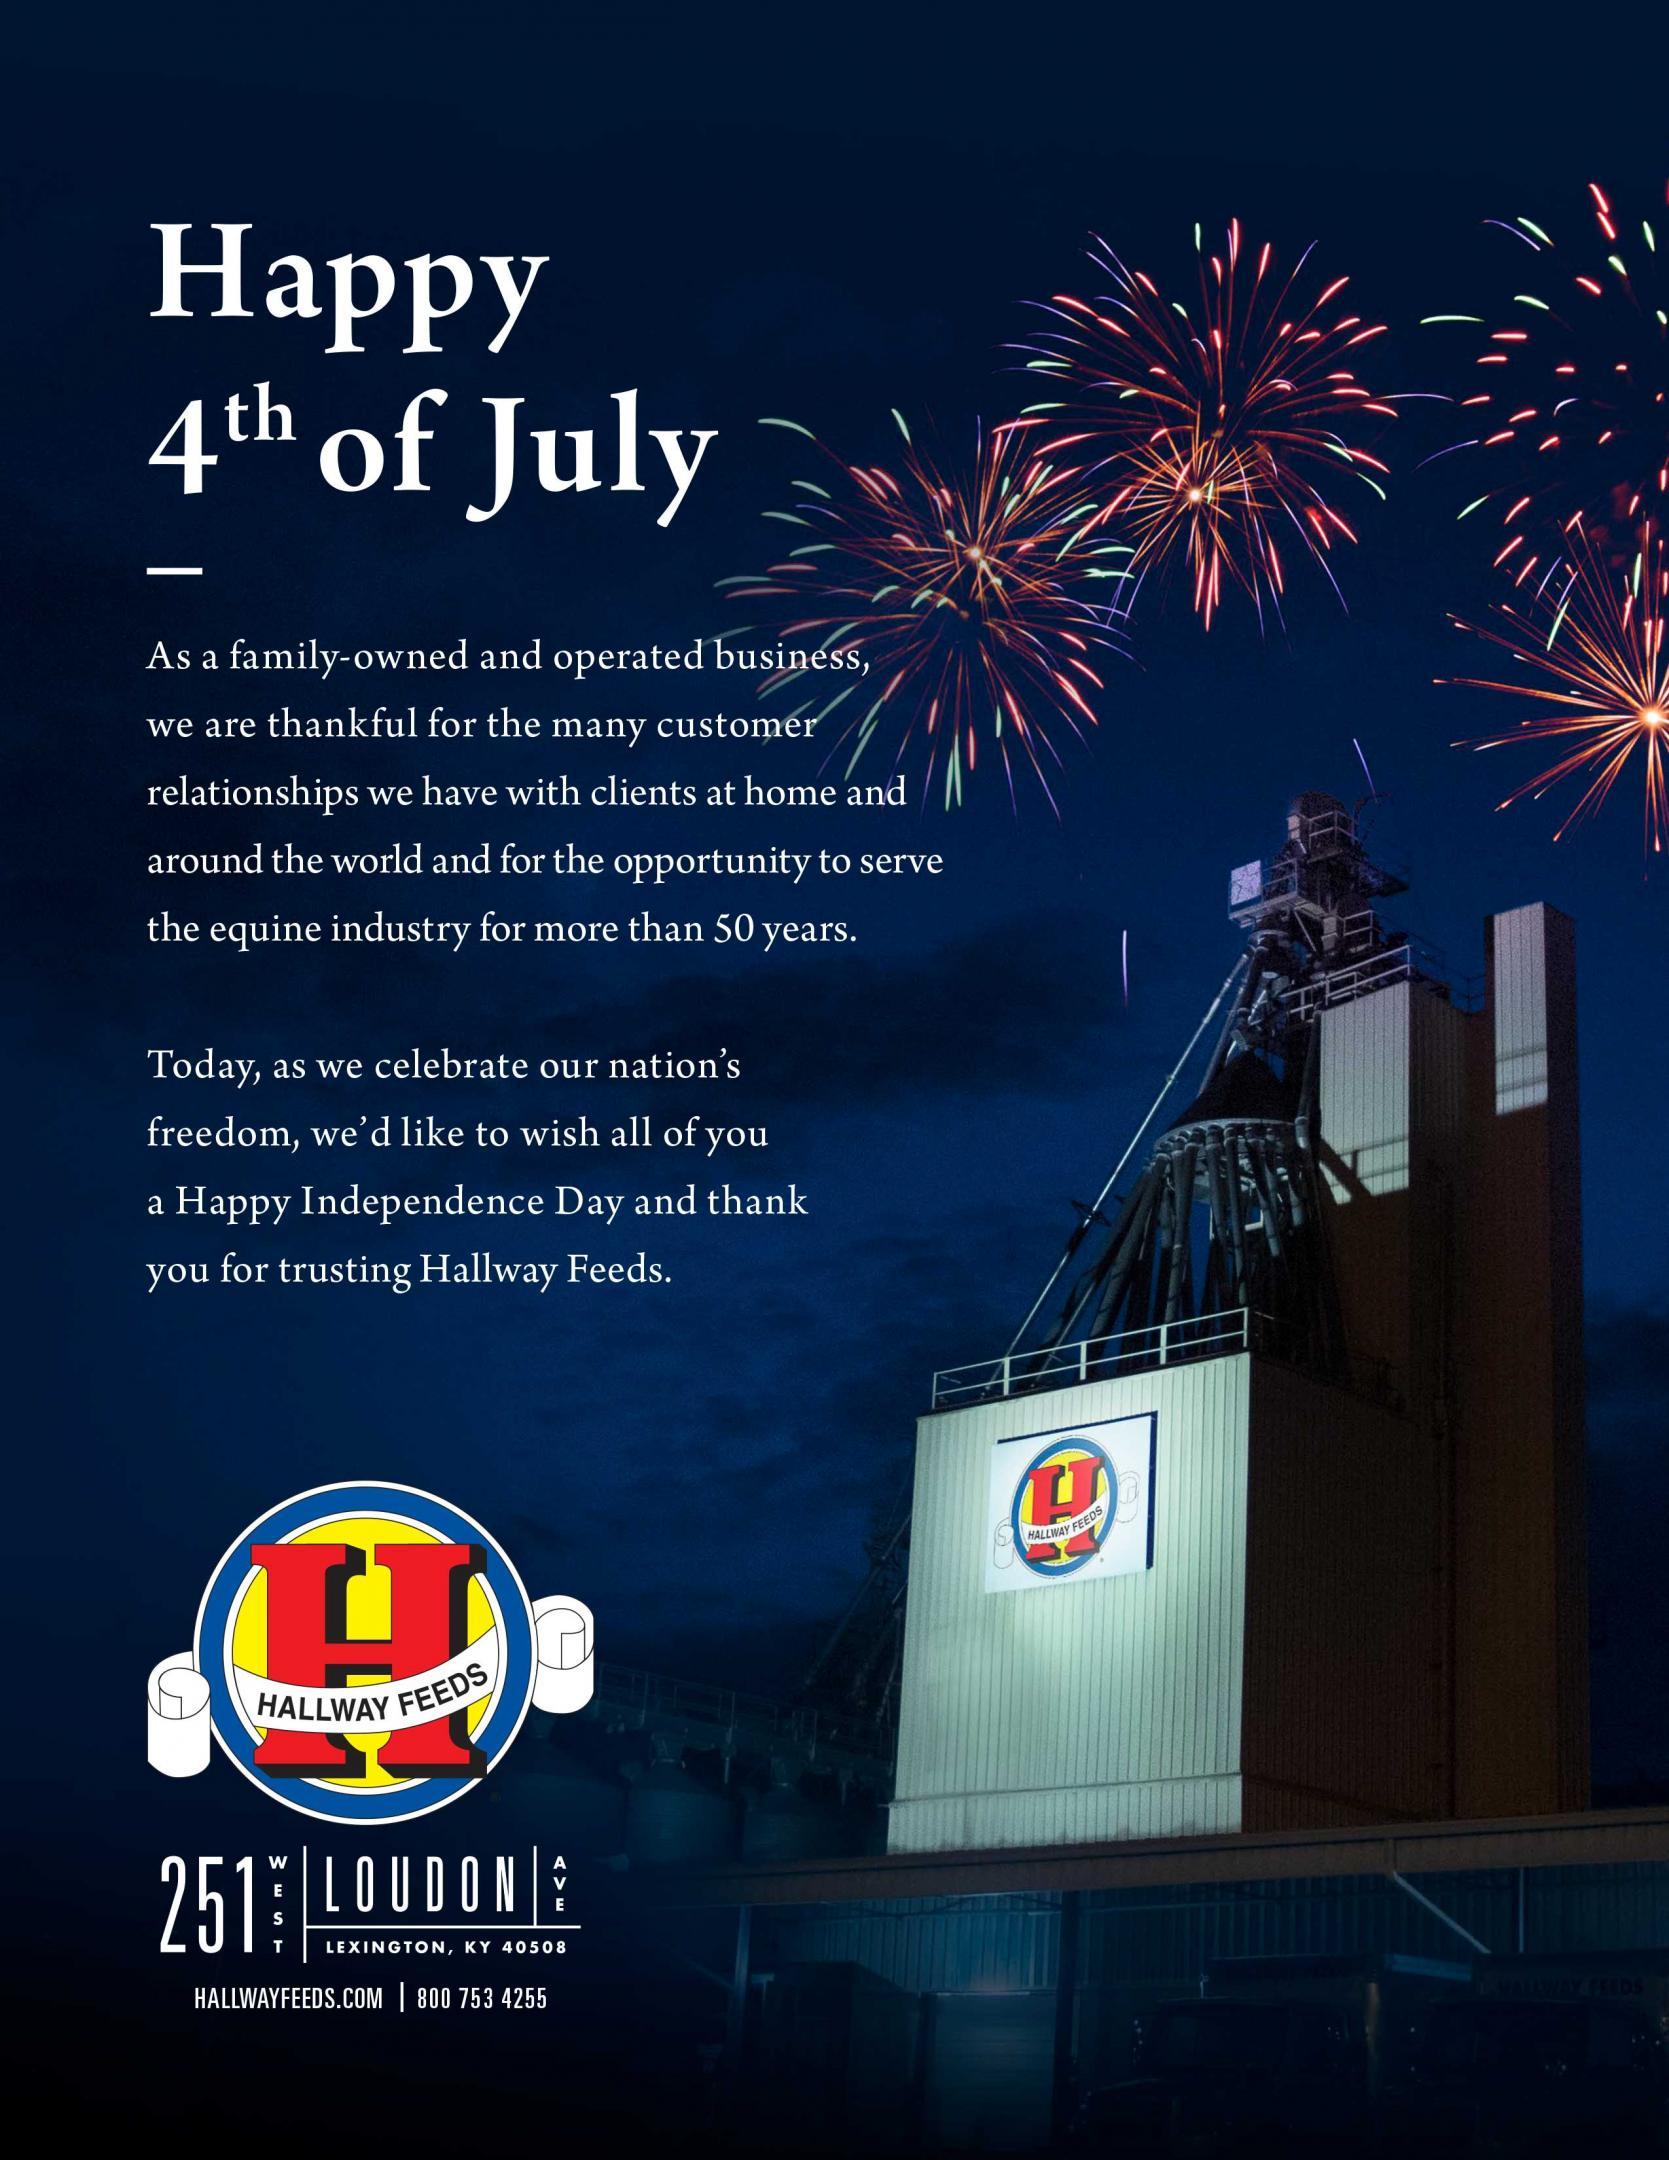 175504-HallwayFeeds-Fireworks-TDN-FINAL.jpg